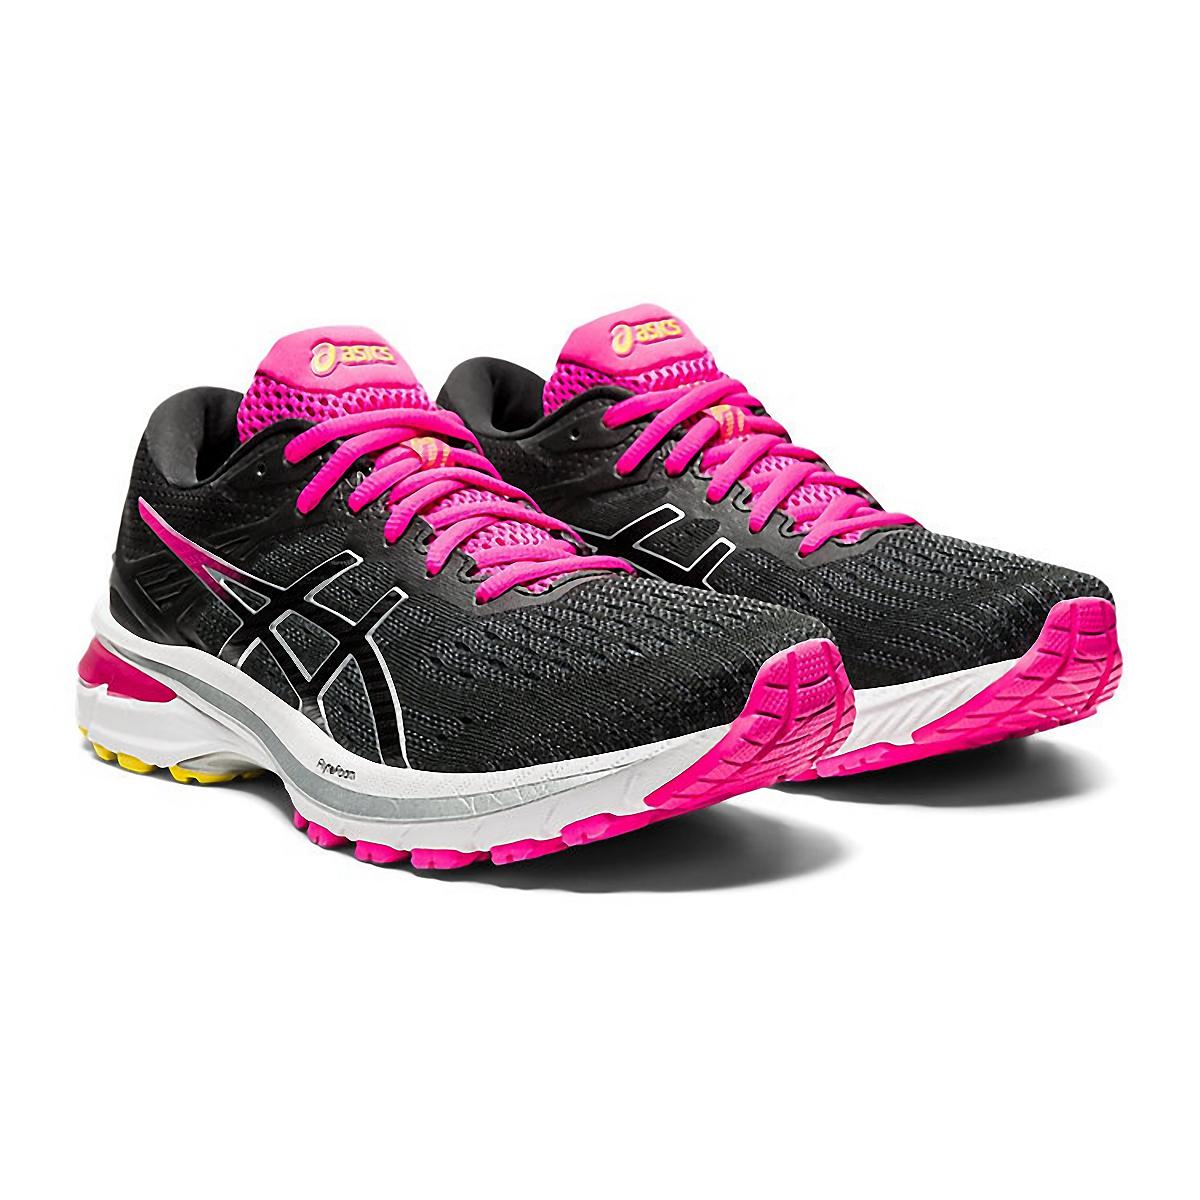 Women's Asics GT-2000 9 Running Shoe - Color: Graphite Grey/Black - Size: 5 - Width: Regular, Graphite Grey/Black, large, image 4